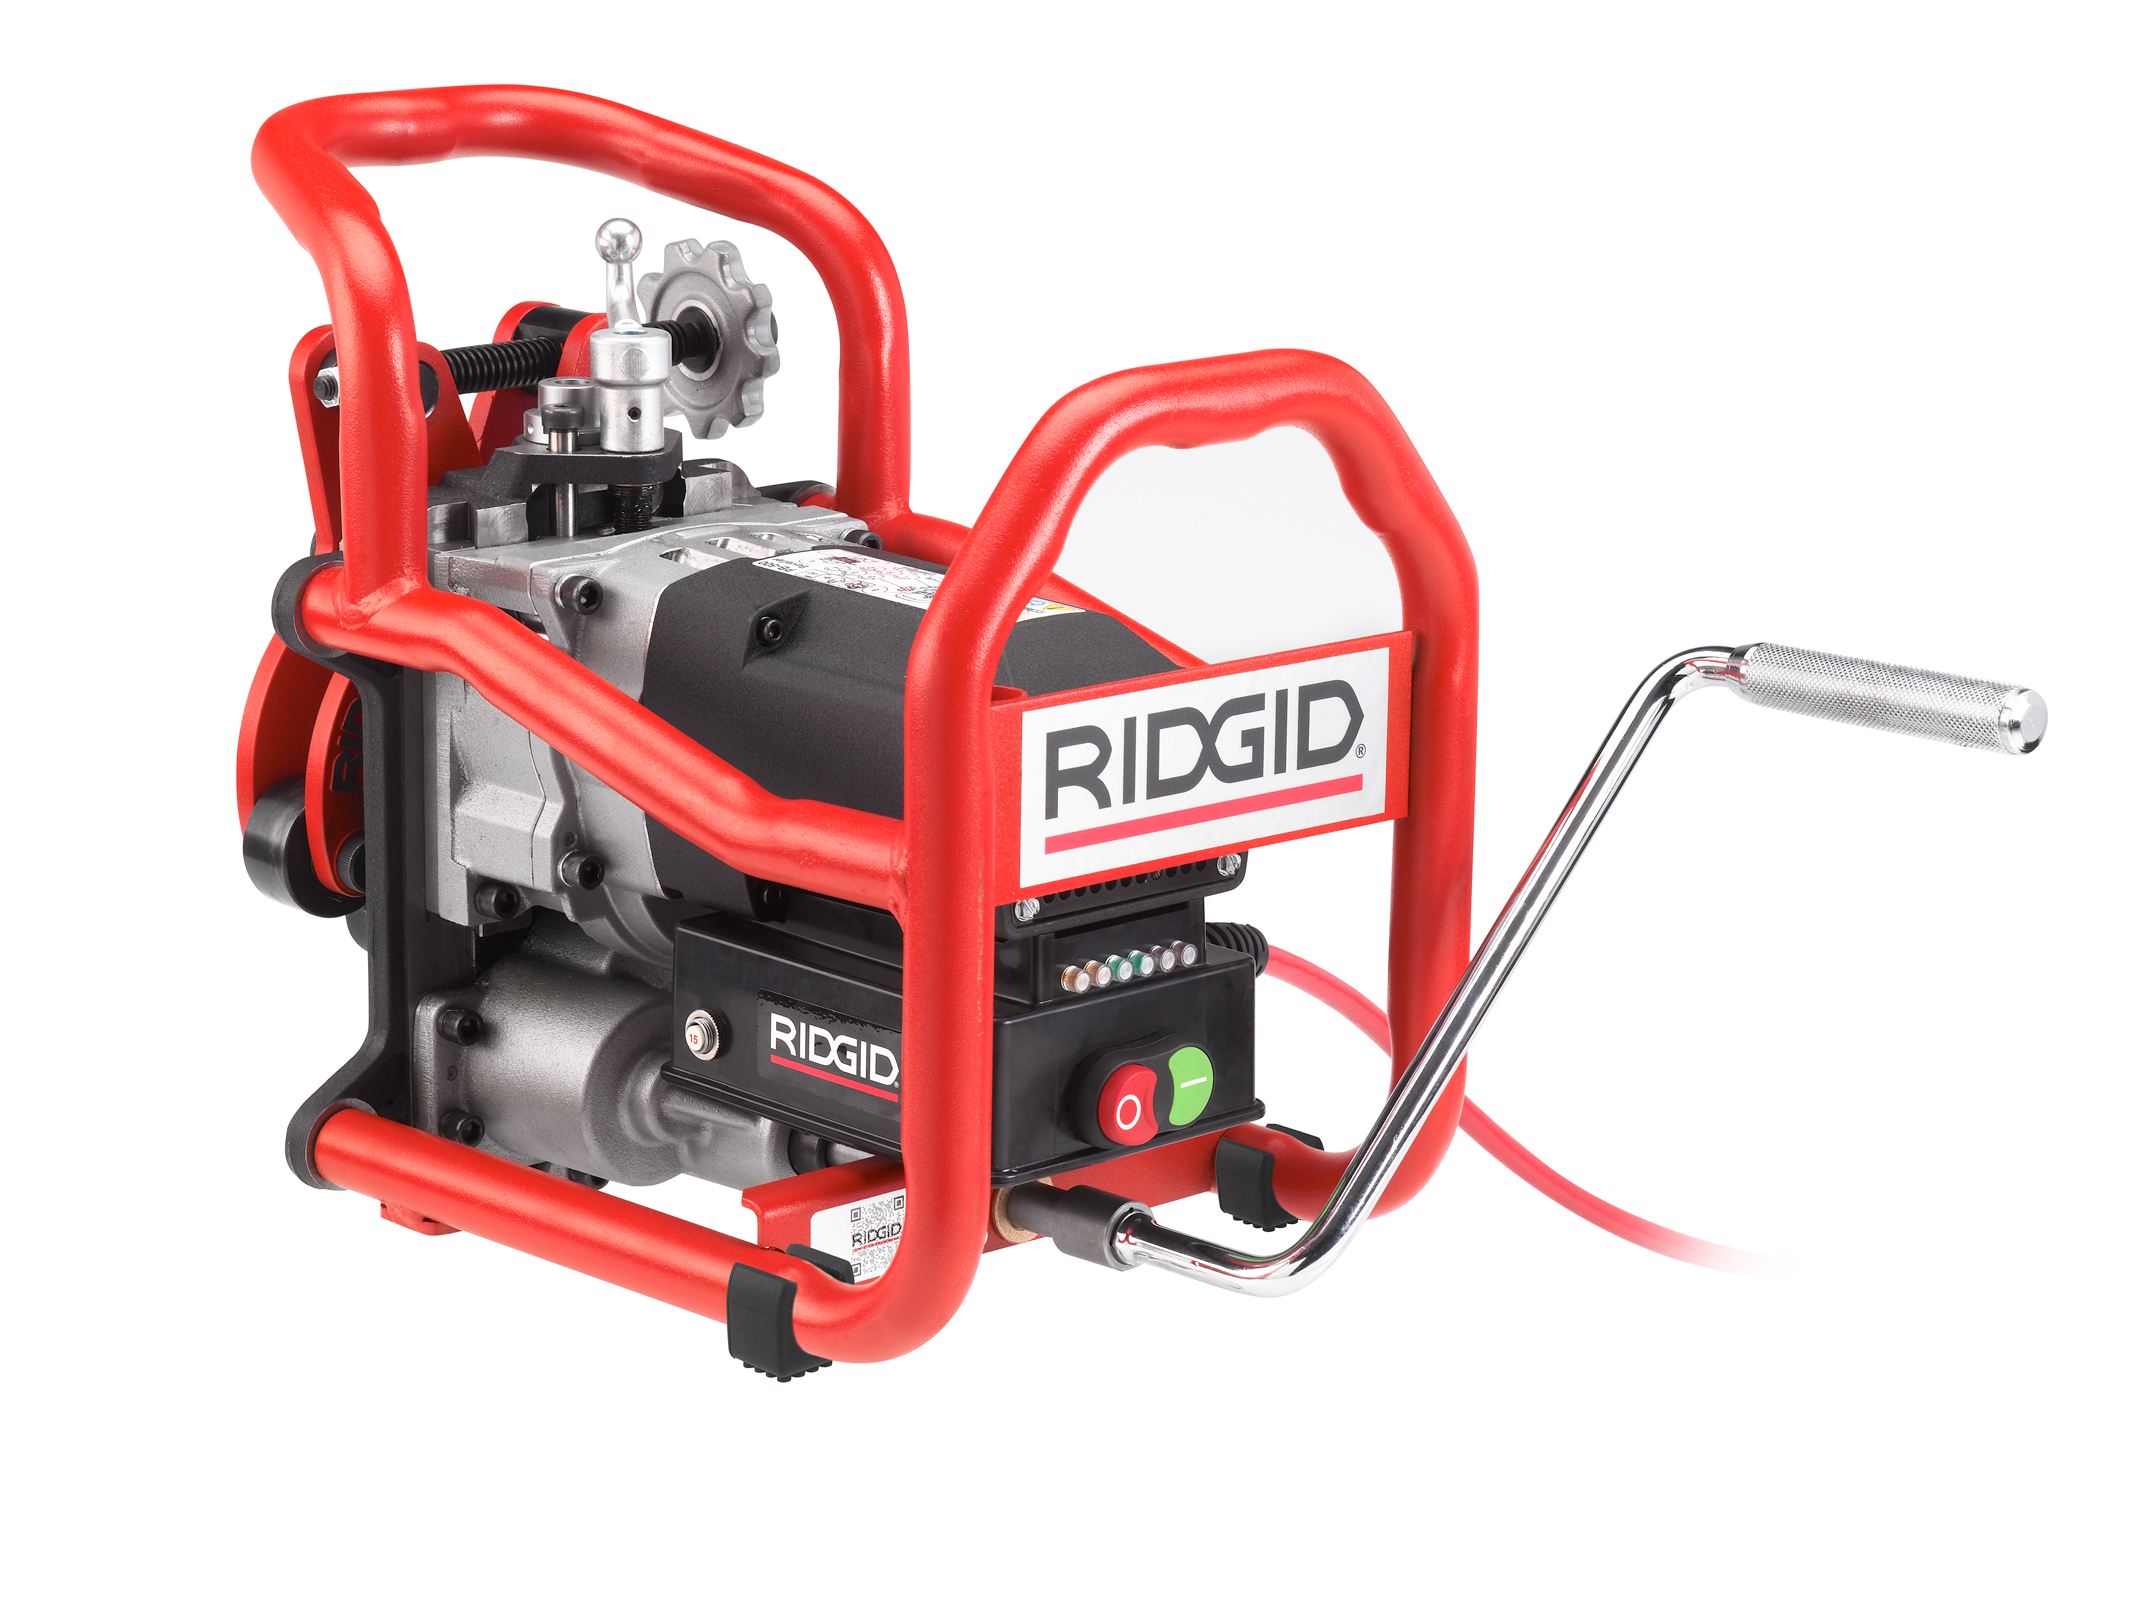 RIDGID 49303 - B-500 Transportable Pipe Beveller w/371/2° Cutter Head 220v